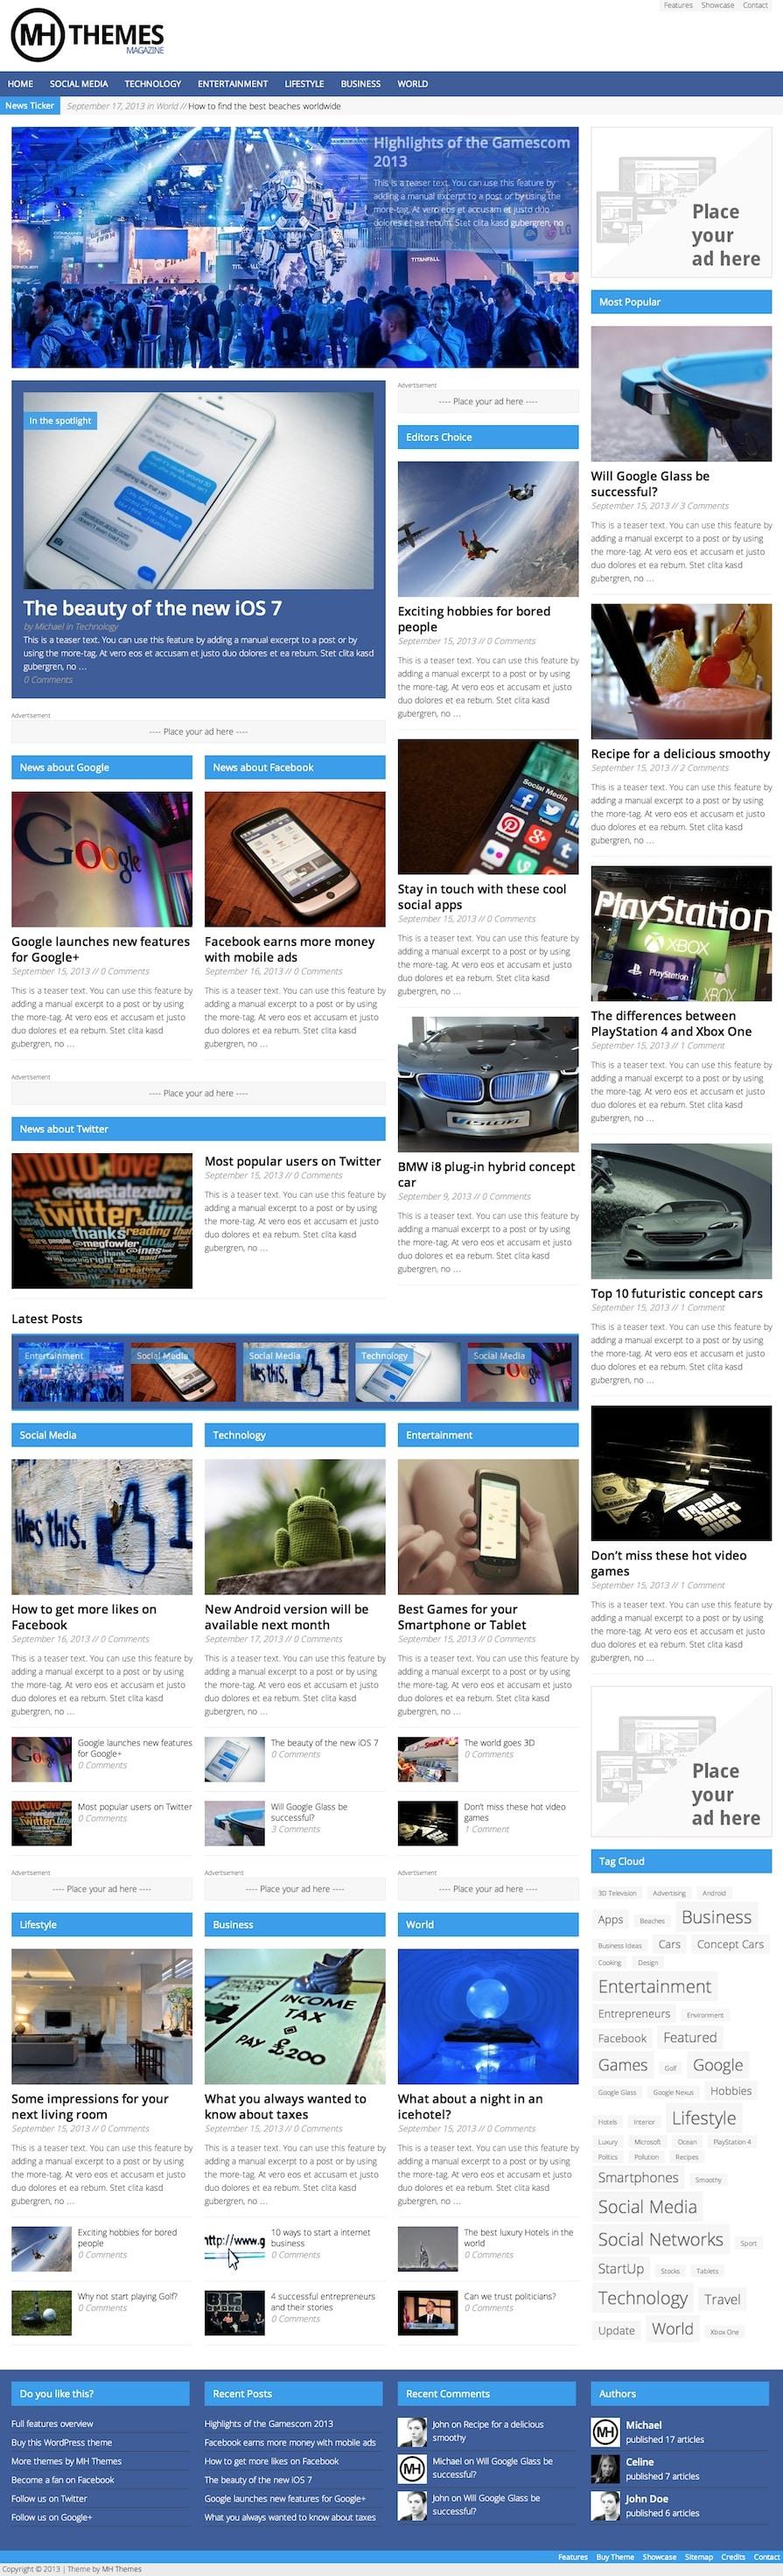 Google themes bmw - Mh Magazine Wordpress Theme Demo 2